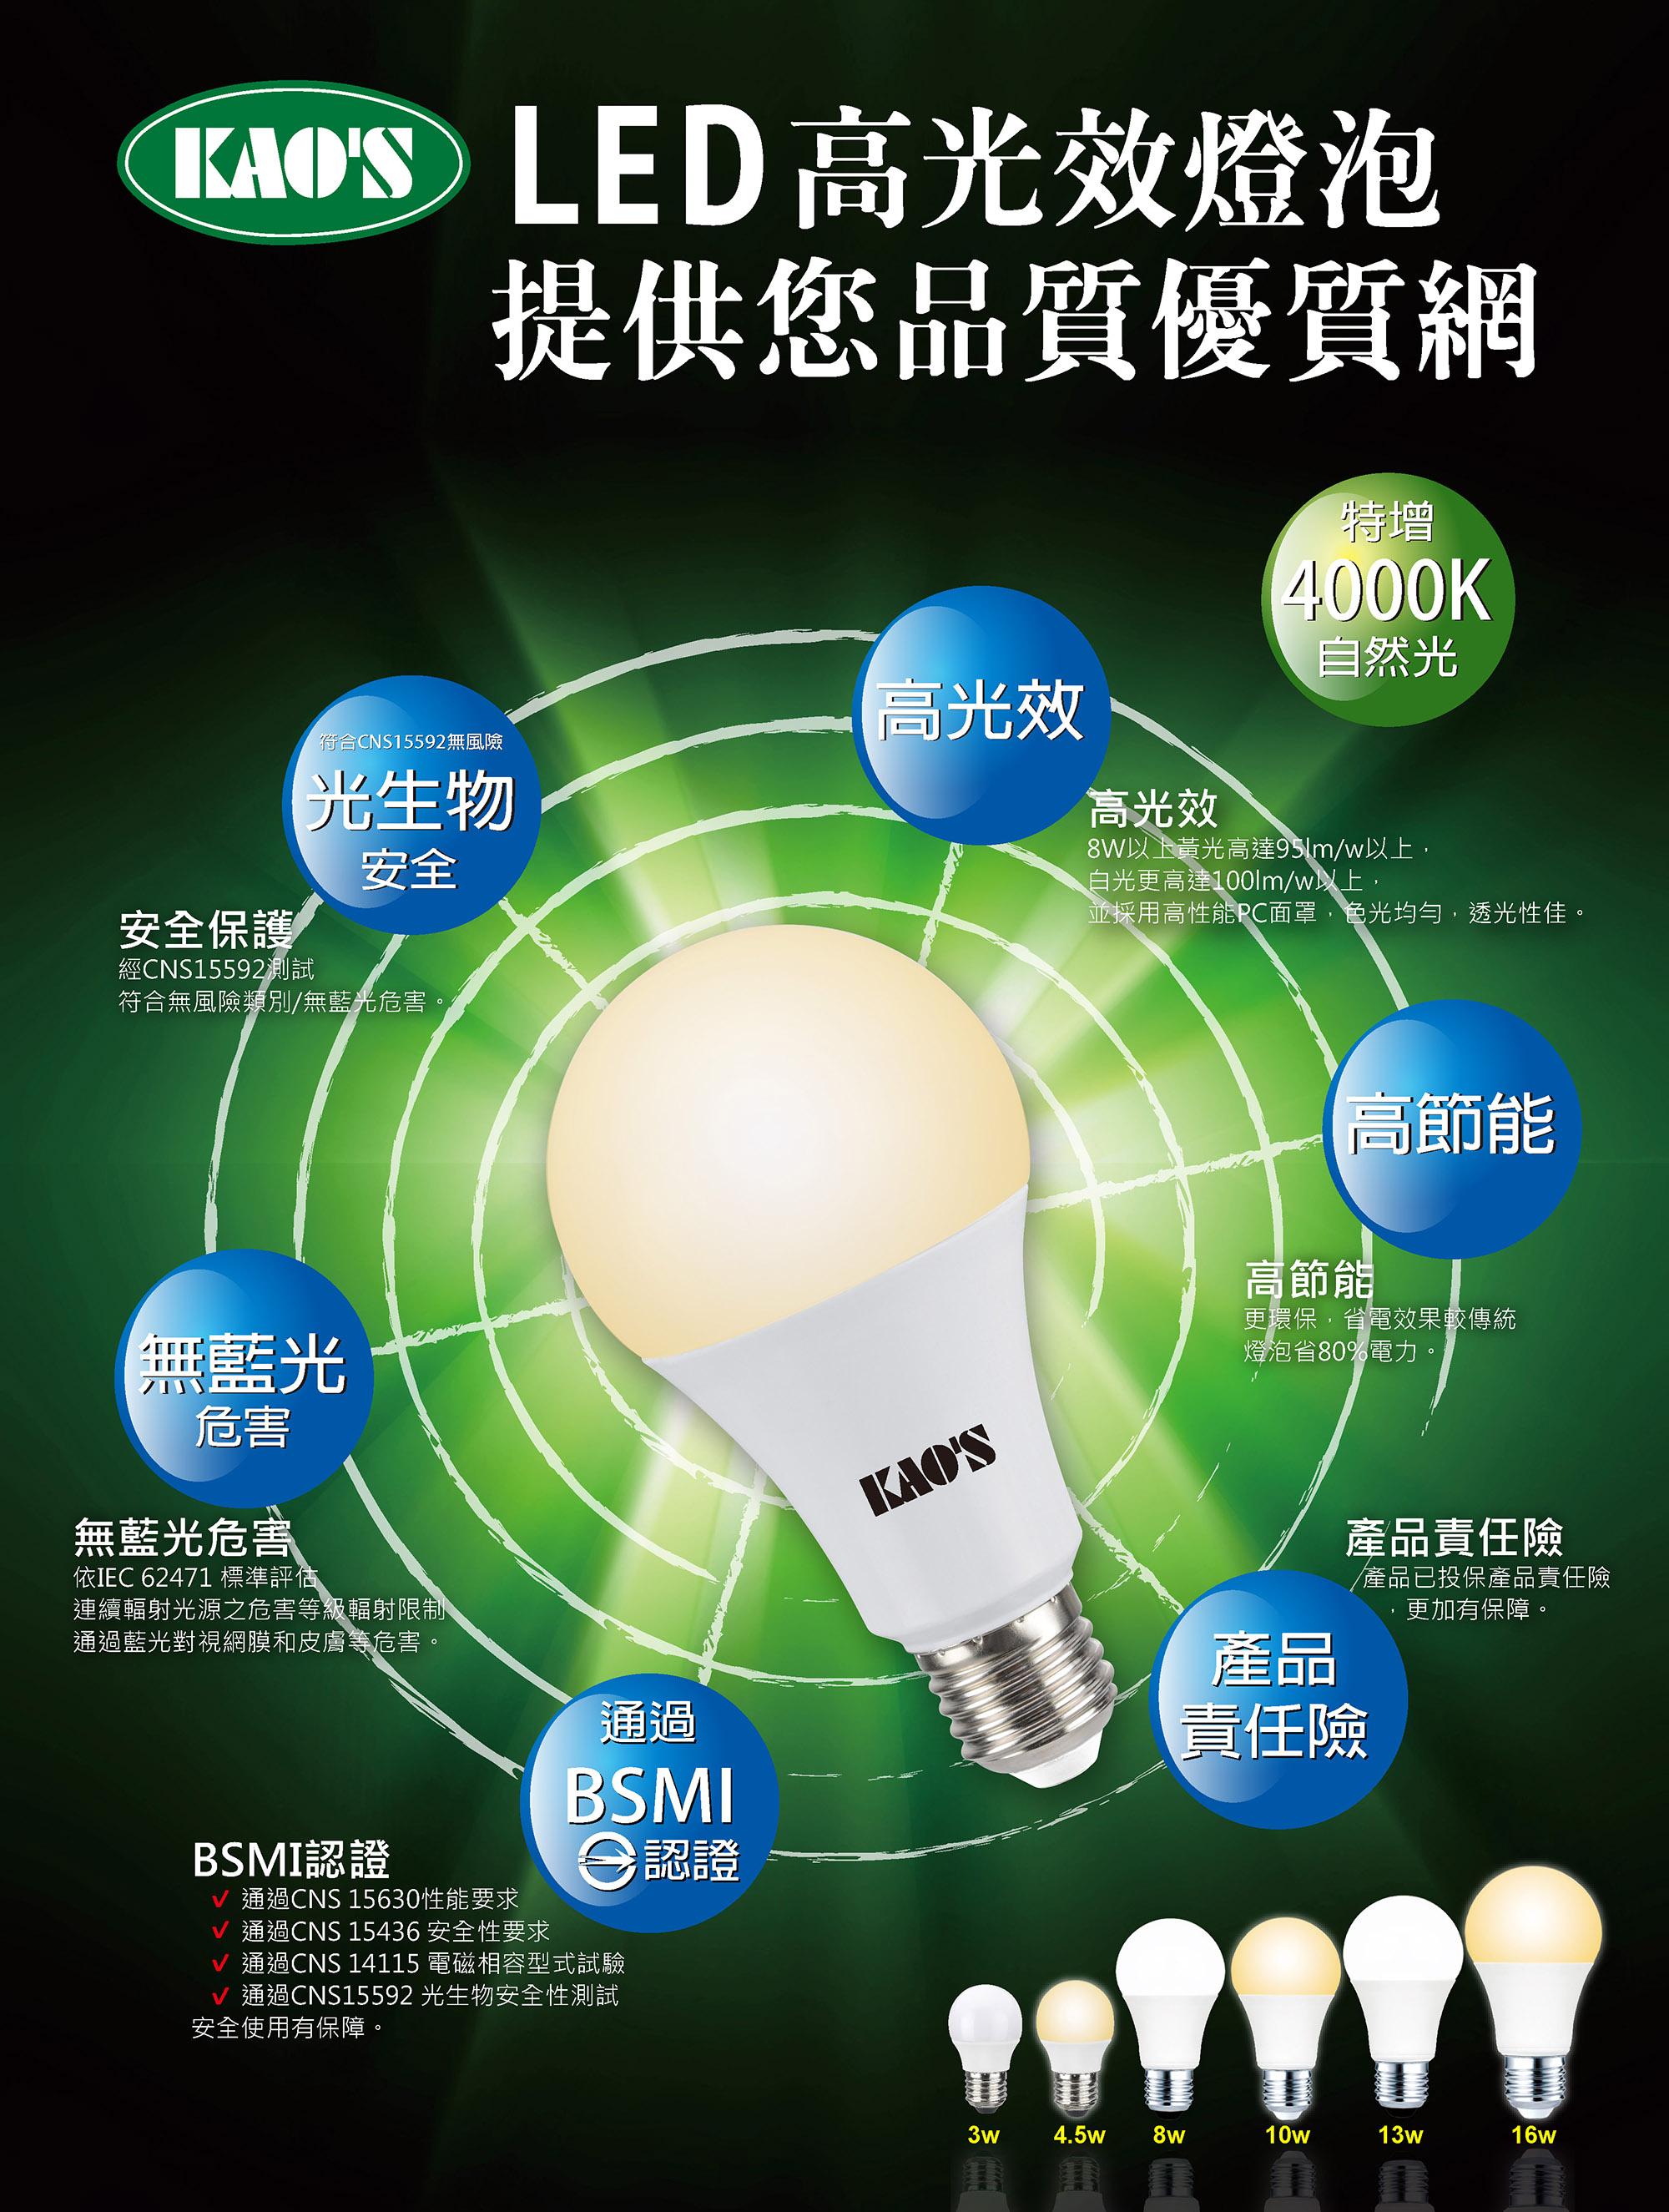 KAOS LED_01.jpg